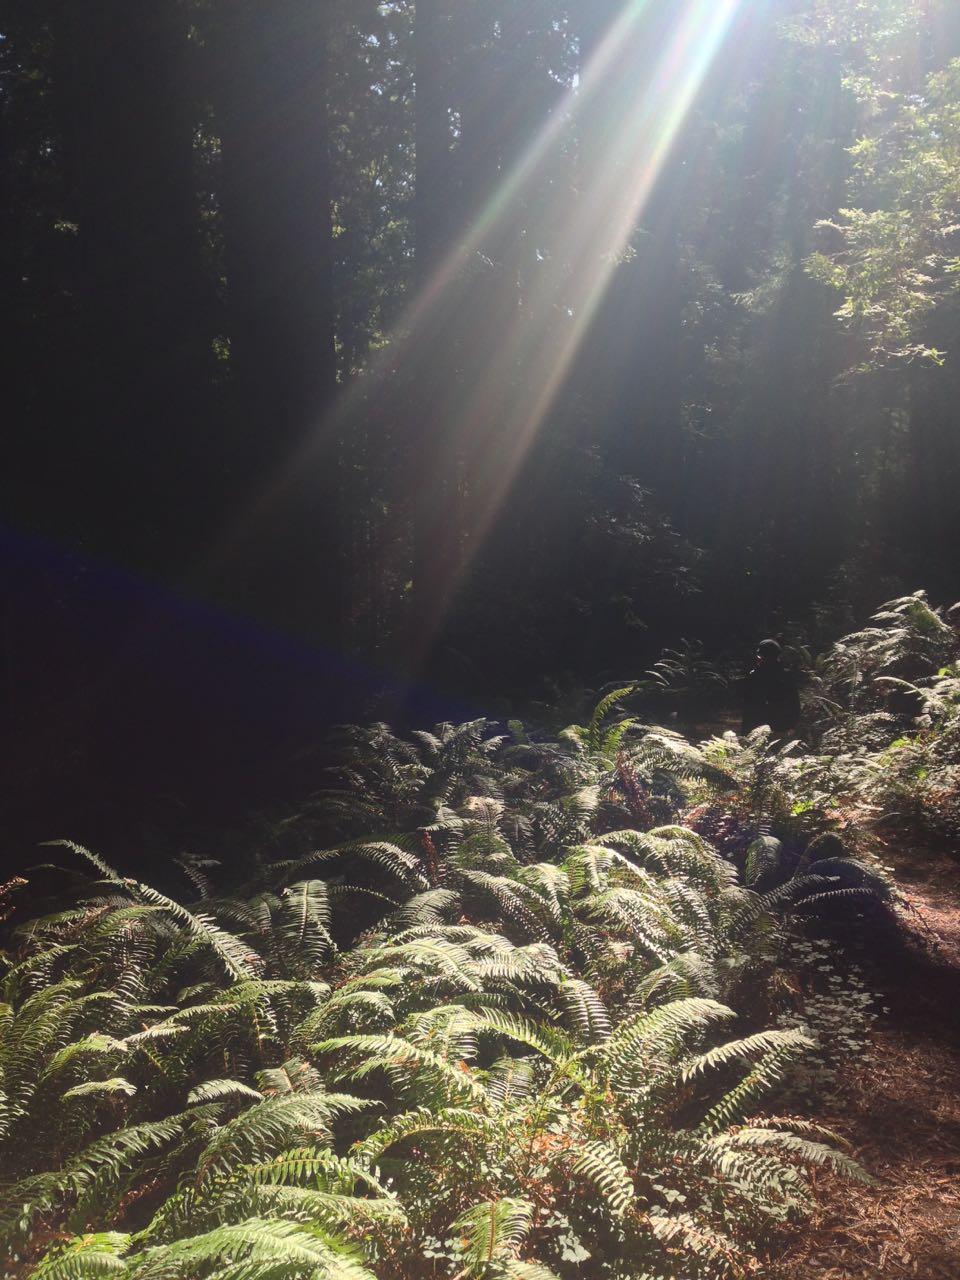 Redwoods 2017 10 08 240 Of 287